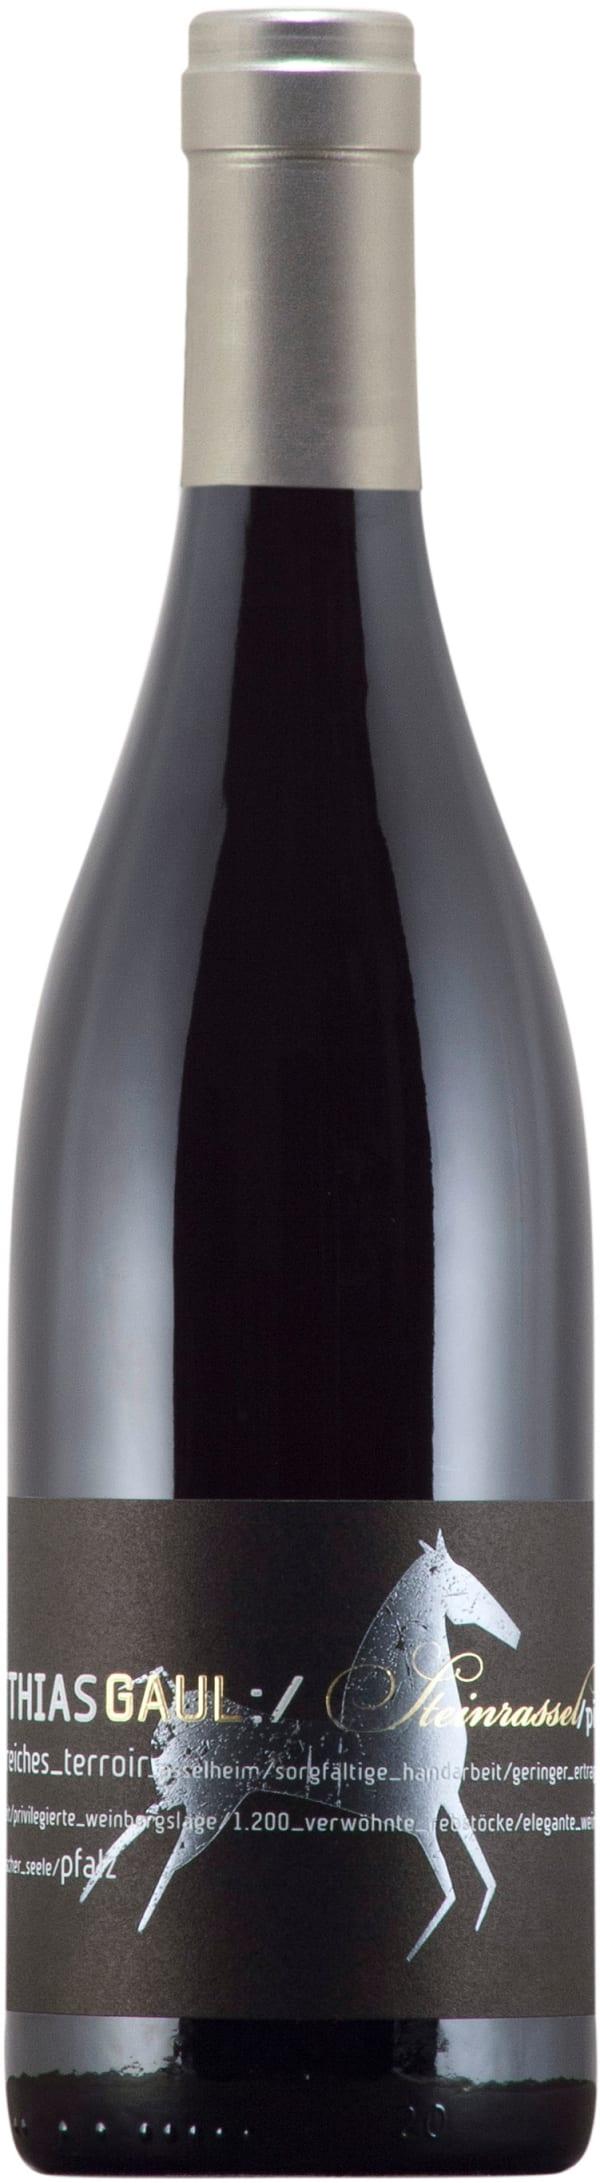 Matthias Gaul Steinrassel Pinot Noir 2017